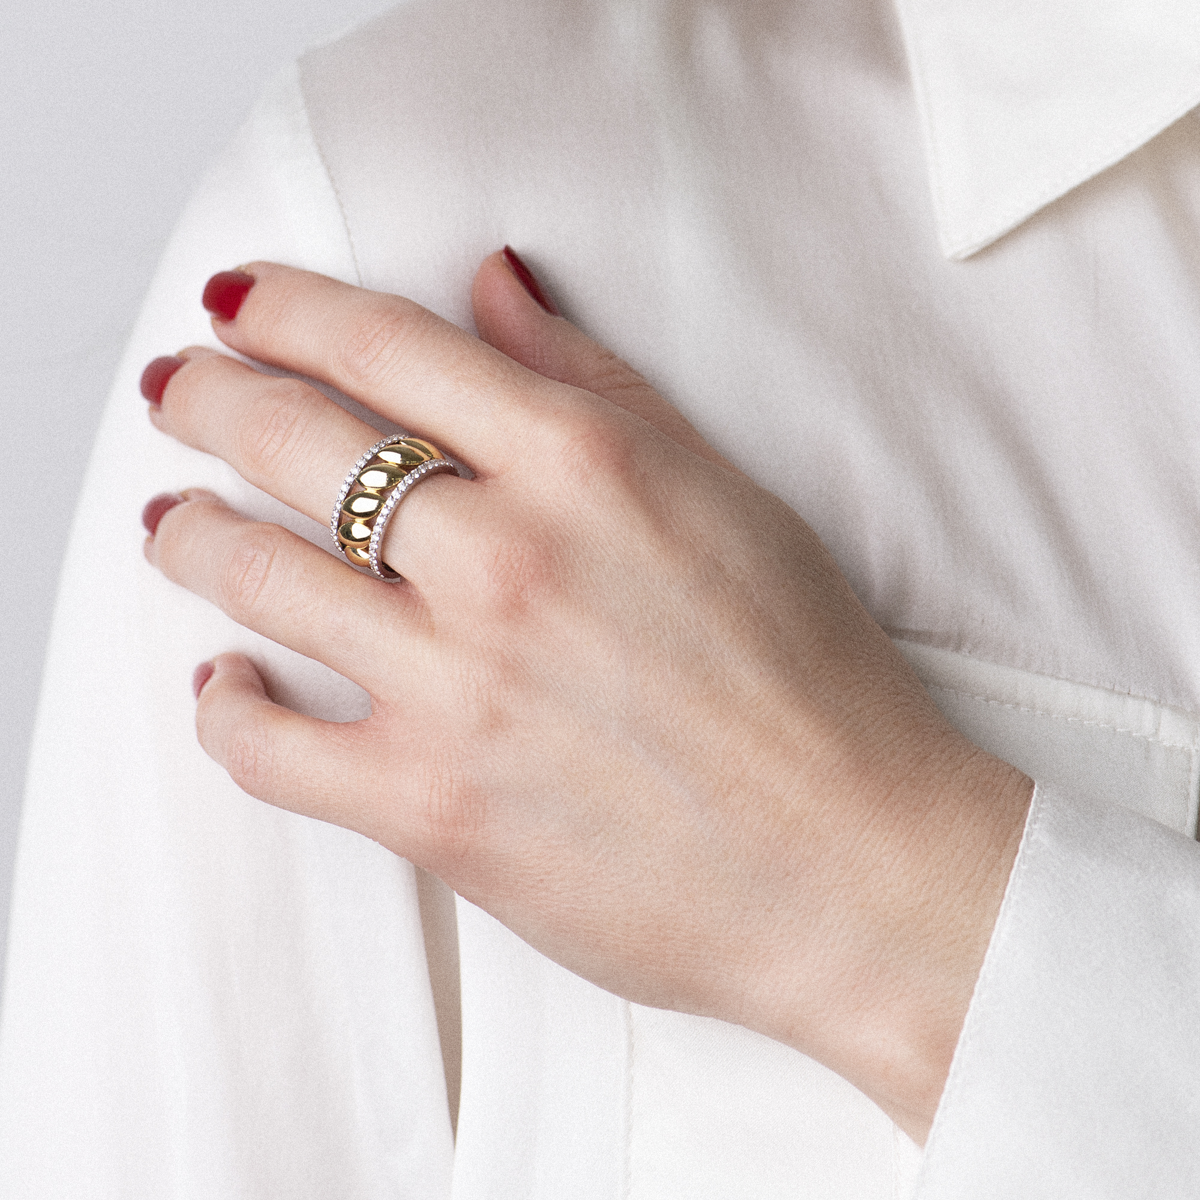 vulsini ring in Rosa gold